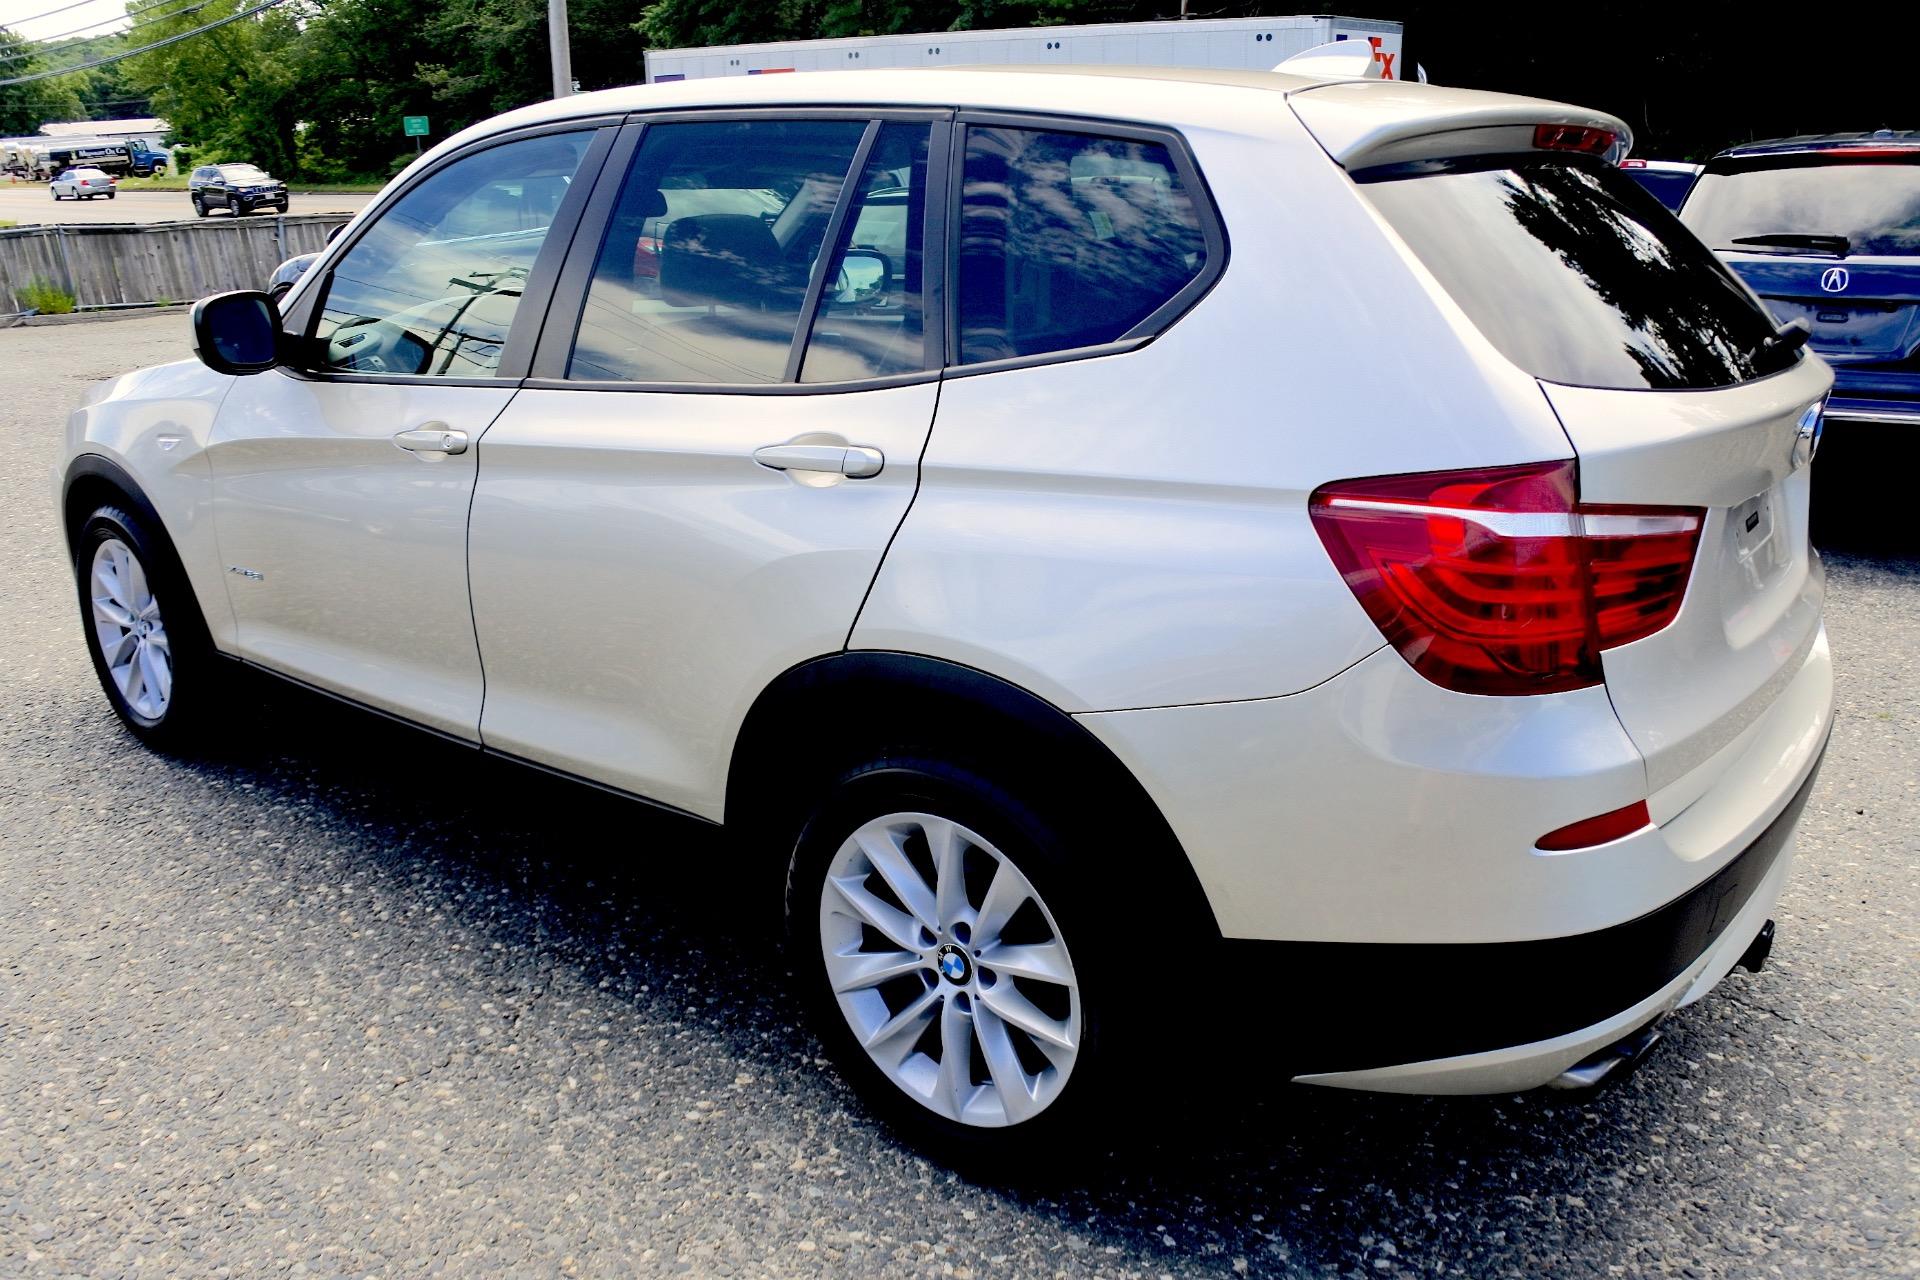 Used 2013 BMW X3 AWD 4dr xDrive28i Used 2013 BMW X3 AWD 4dr xDrive28i for sale  at Metro West Motorcars LLC in Shrewsbury MA 3